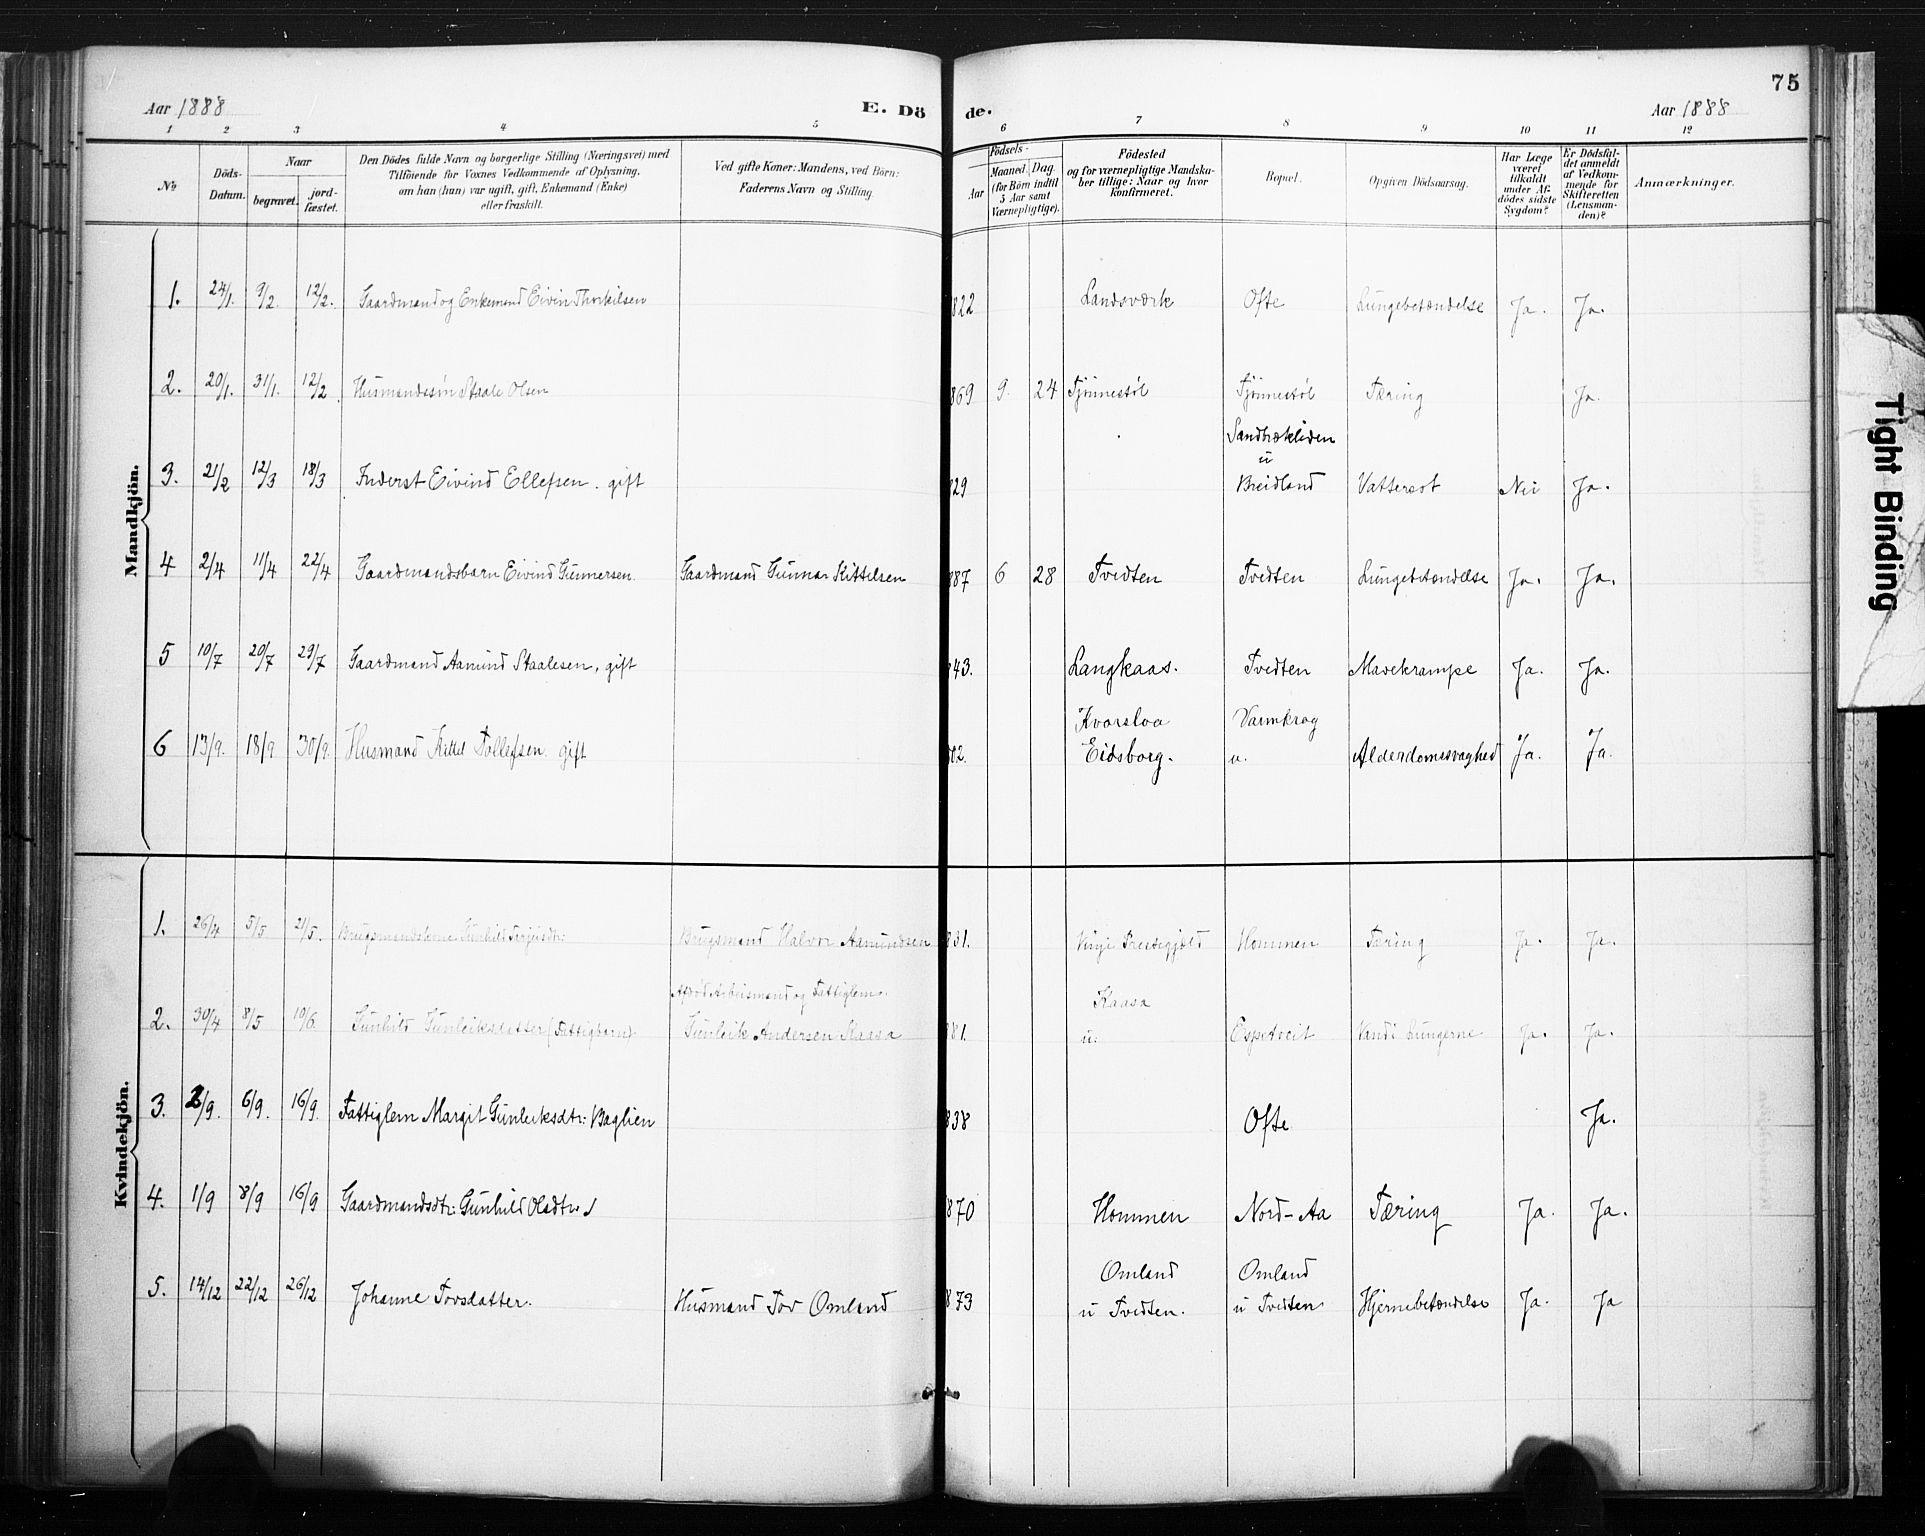 SAKO, Lårdal kirkebøker, F/Fc/L0002: Ministerialbok nr. III 2, 1887-1906, s. 75